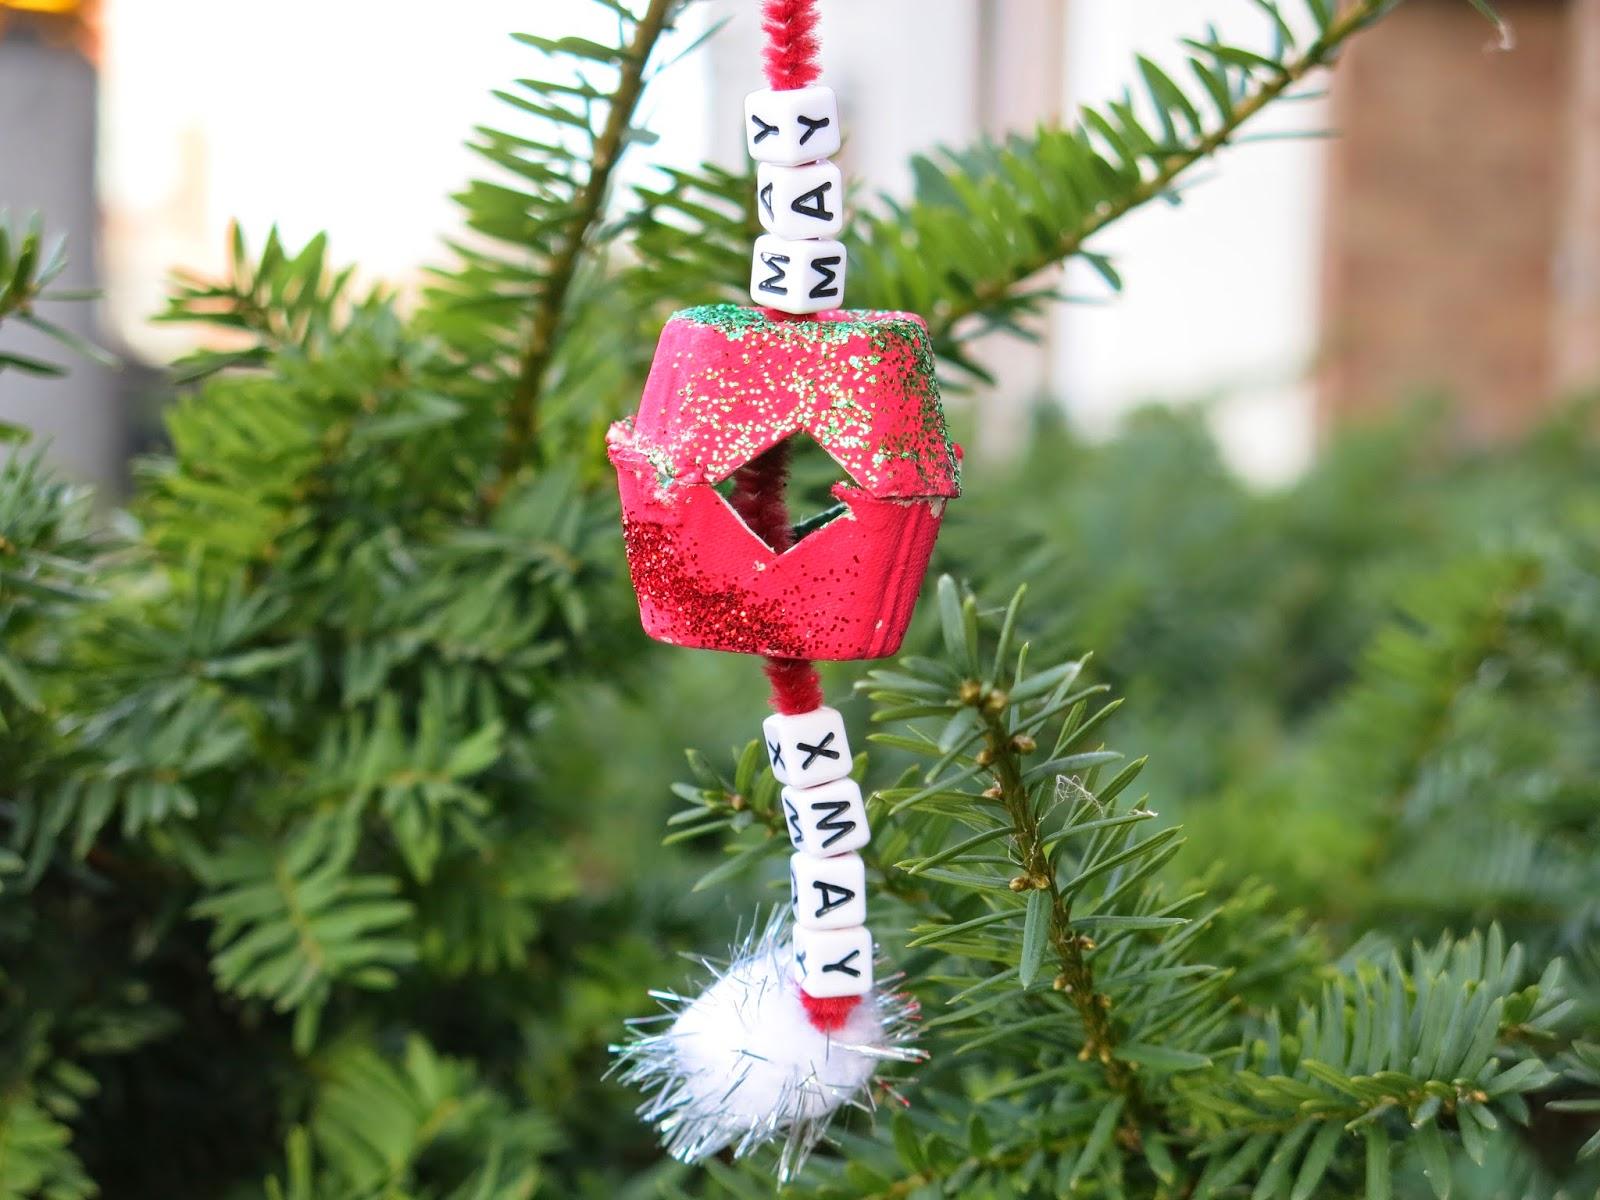 Caker Cooking: Egg Carton Christmas Ornaments